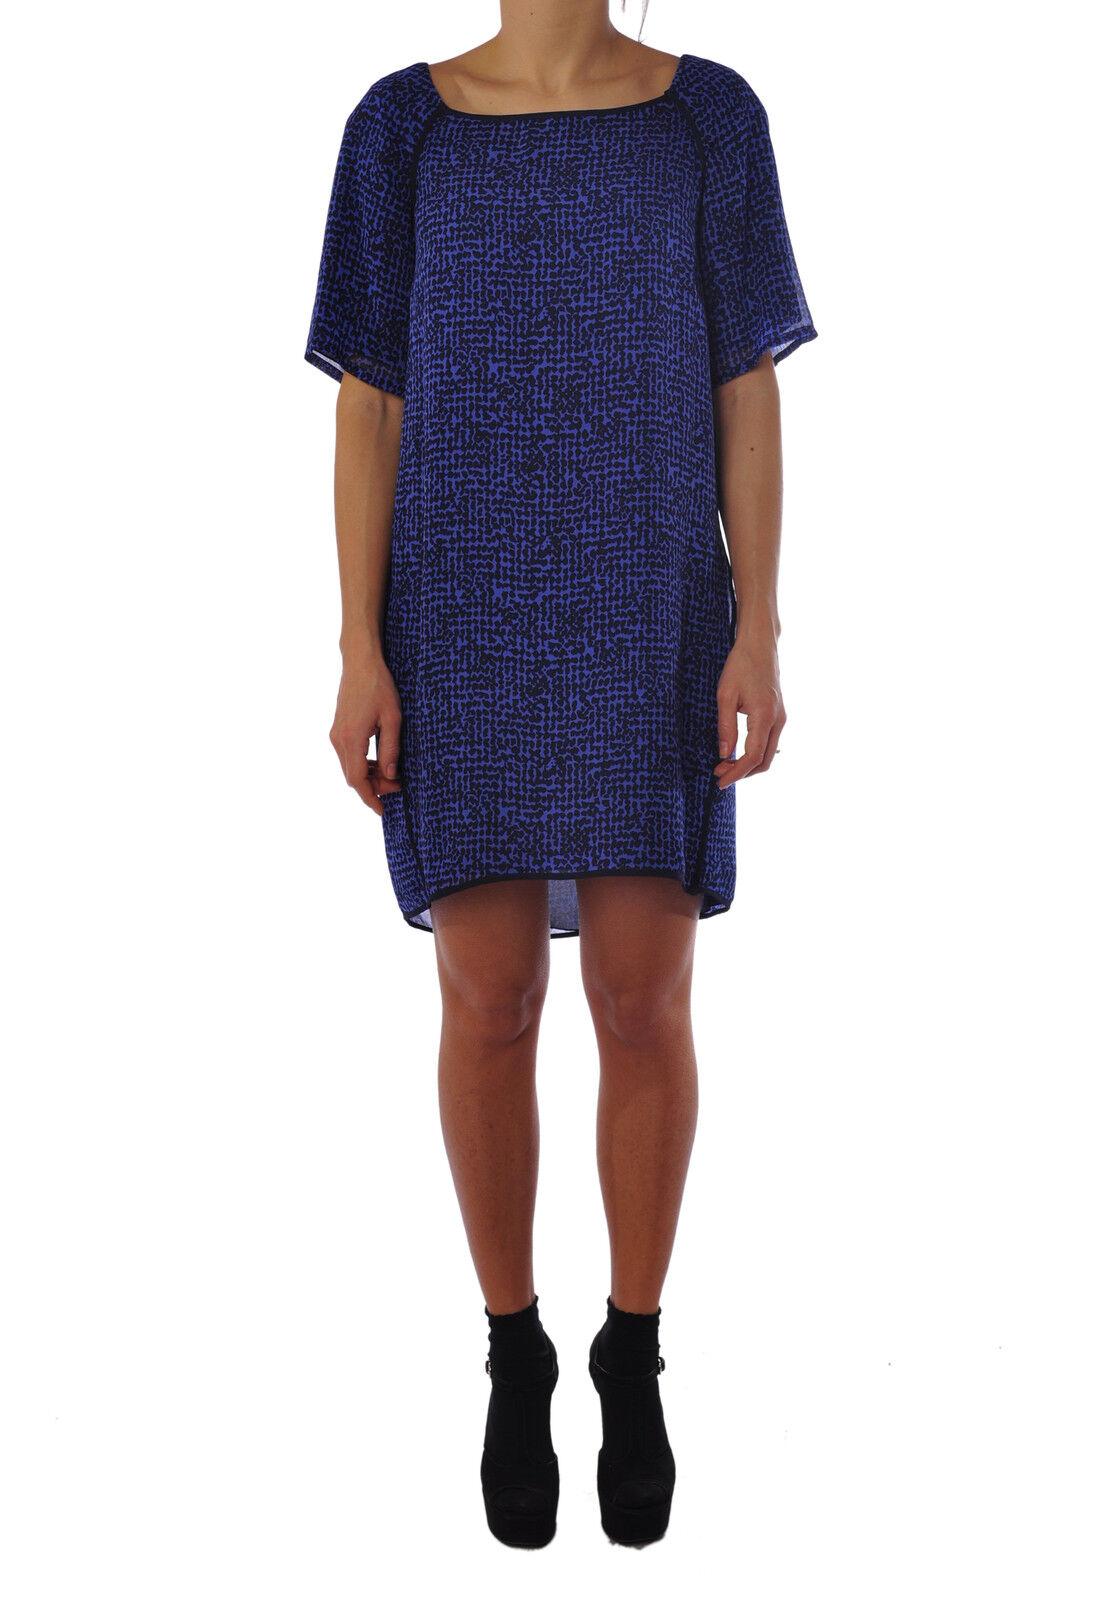 Patrizia Pepe  -  Length - Female - 44 - bluee - 1342104B164811